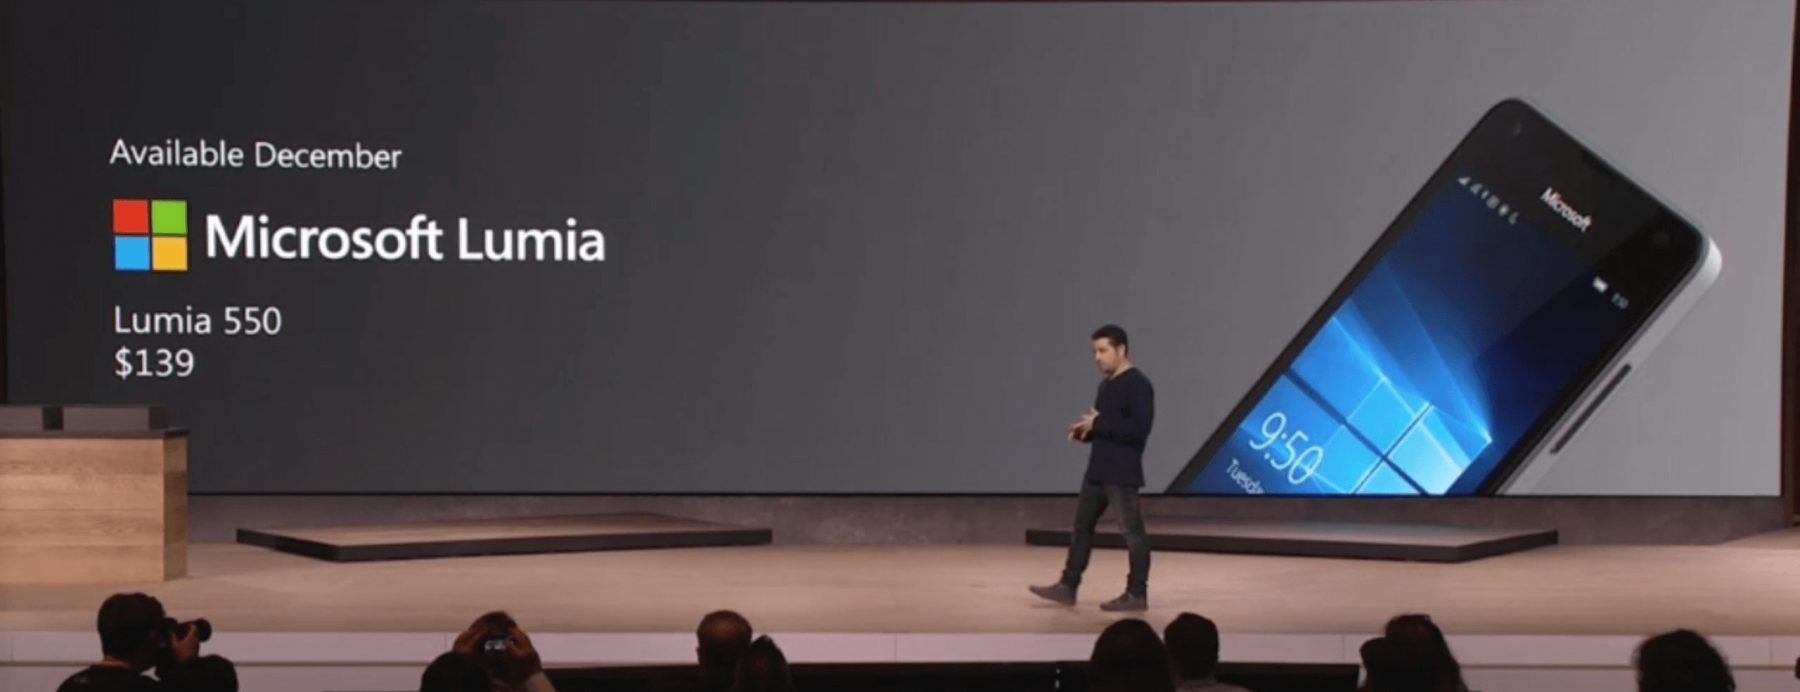 microsoft lumia 550, price